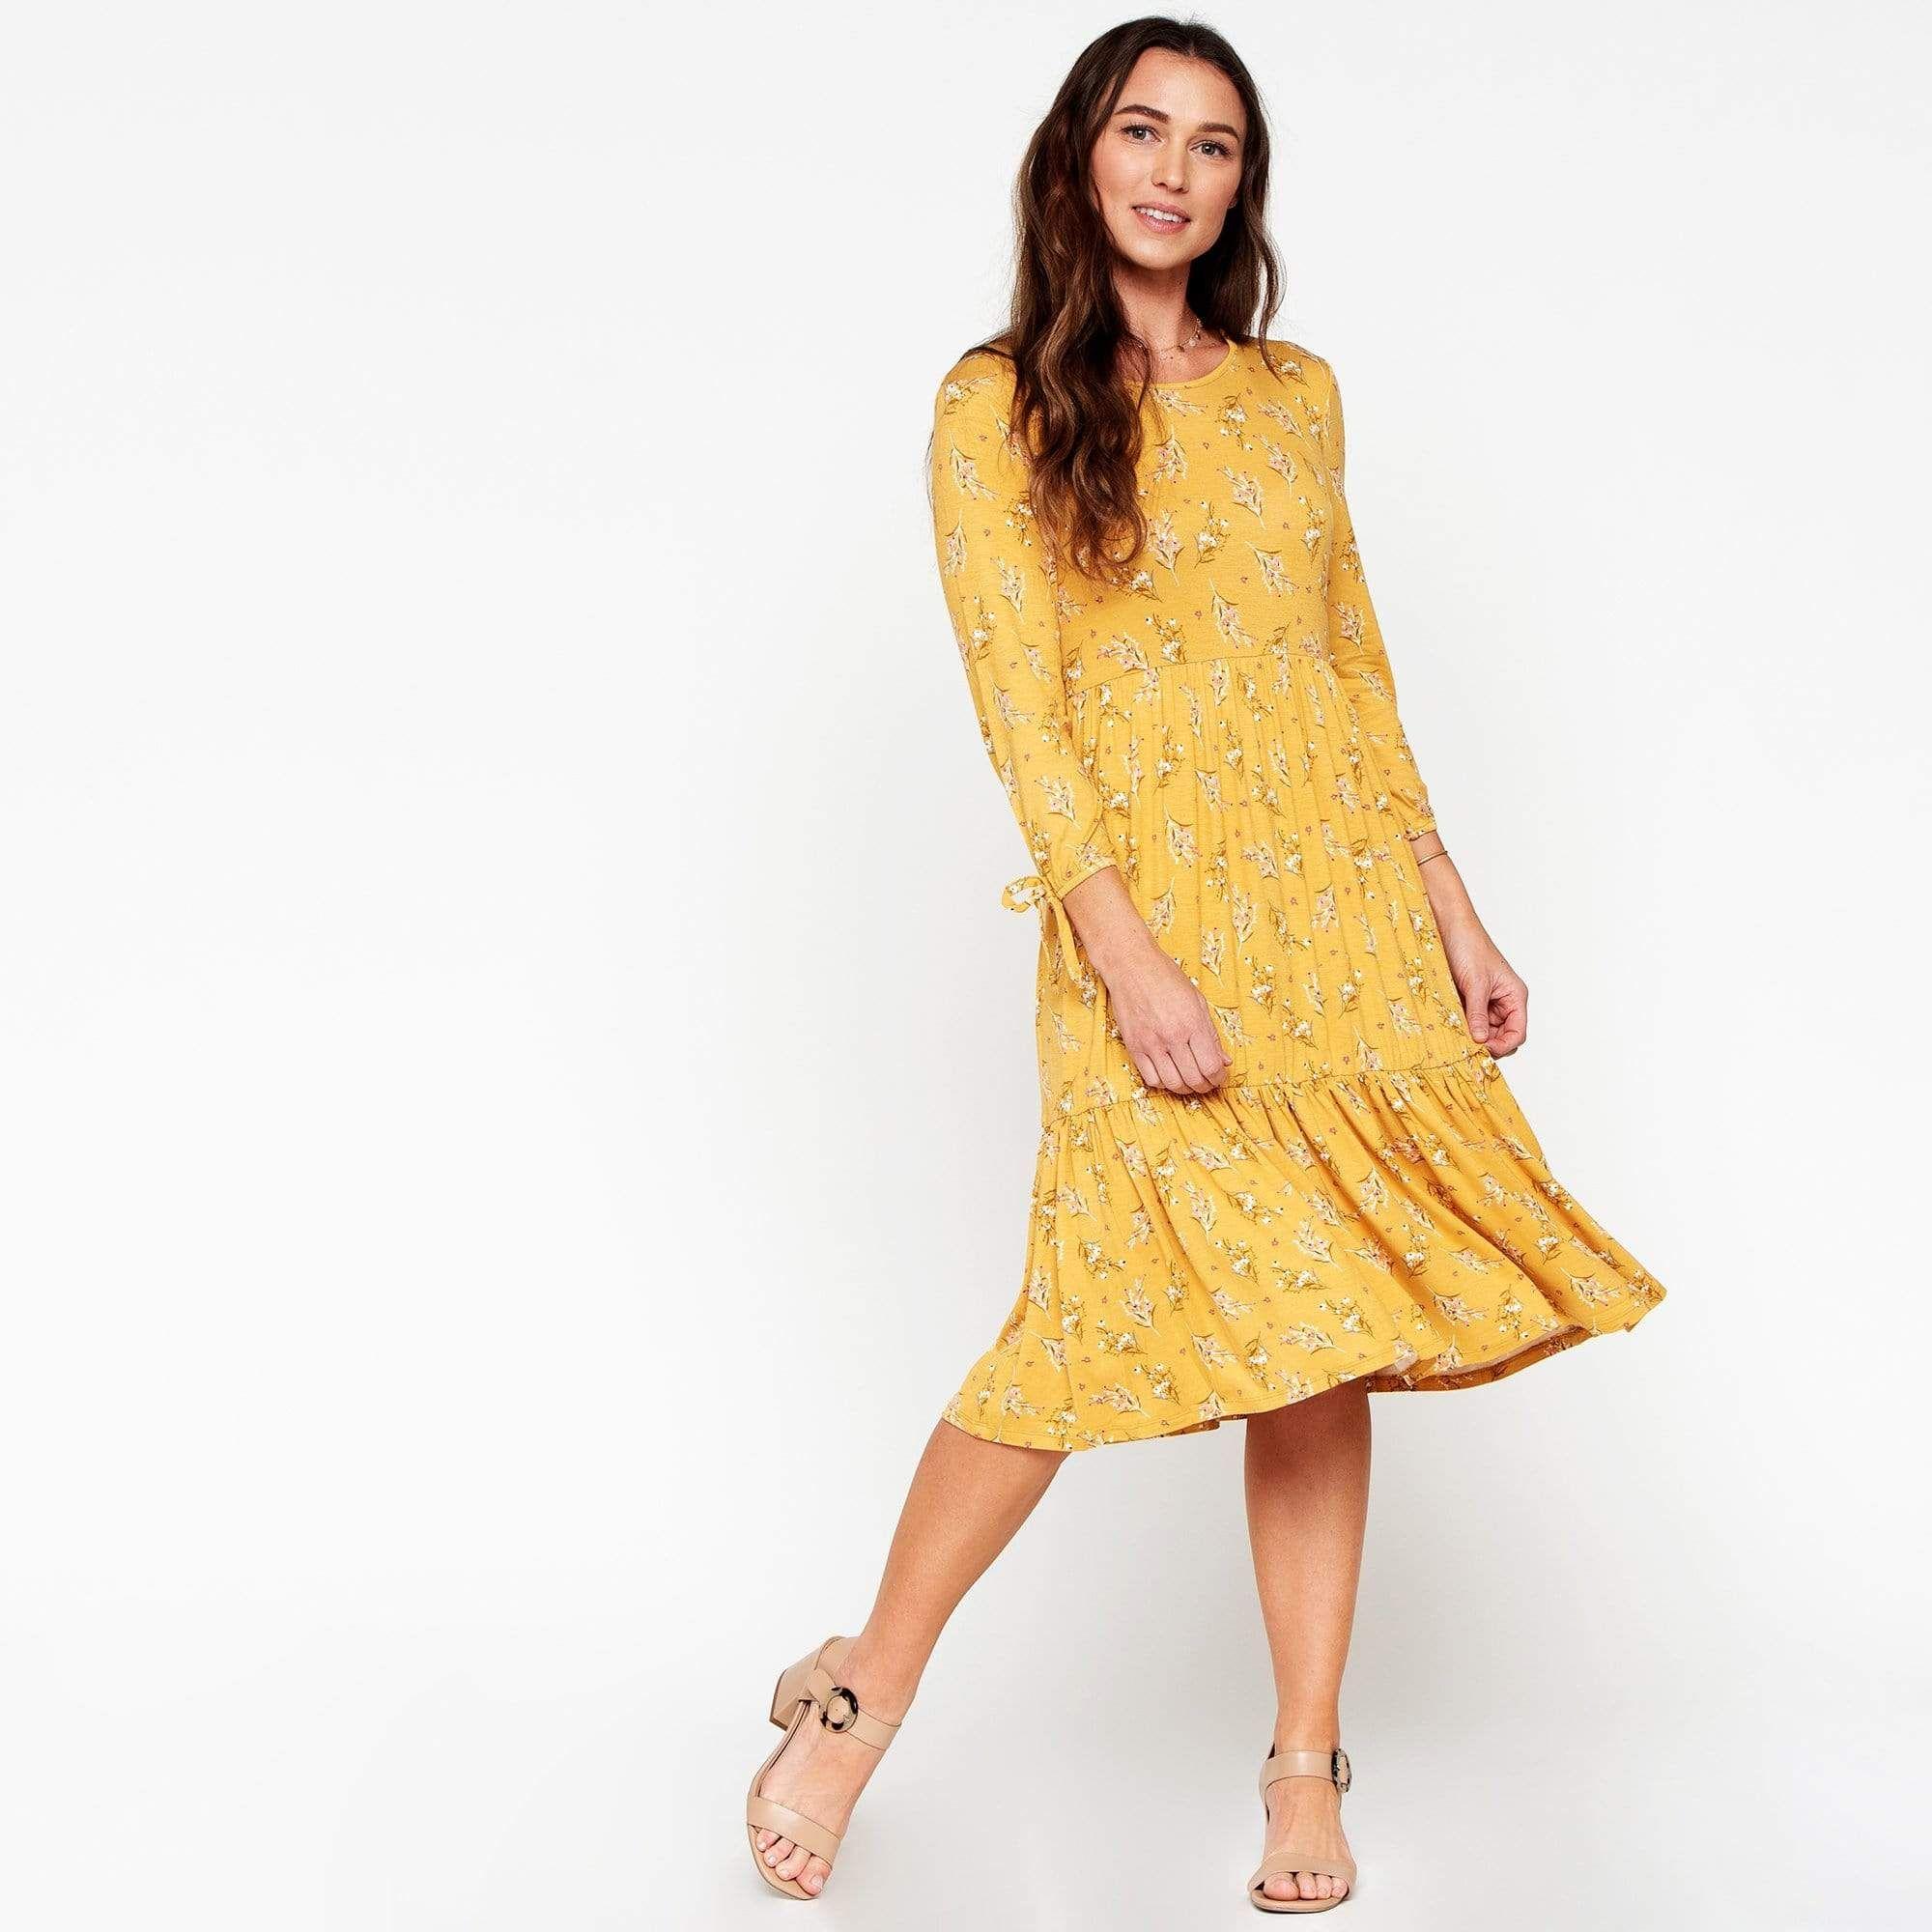 3 4 Sleeve Tiered Dress Downeast In 2020 Tiered Dress Dresses Summer Dresses [ 2000 x 2000 Pixel ]